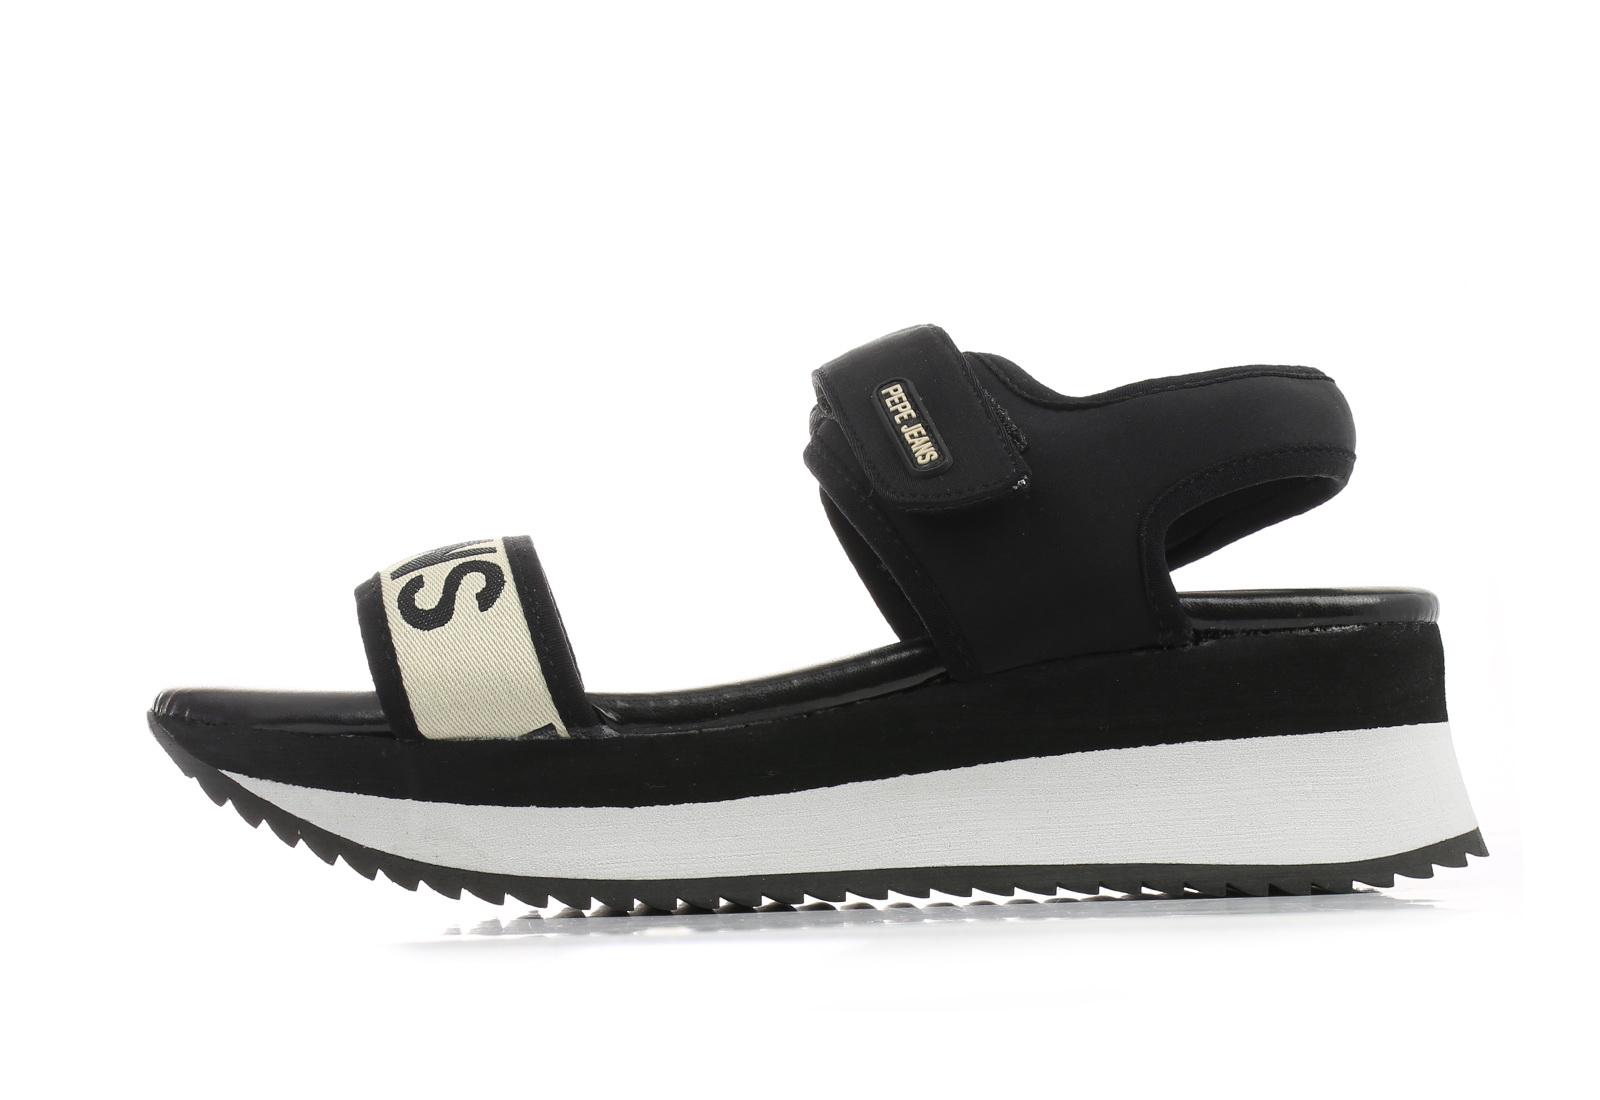 Sandals Online Pls90394999 Shop Pepe Jeans Pls90394 For mN8n0w